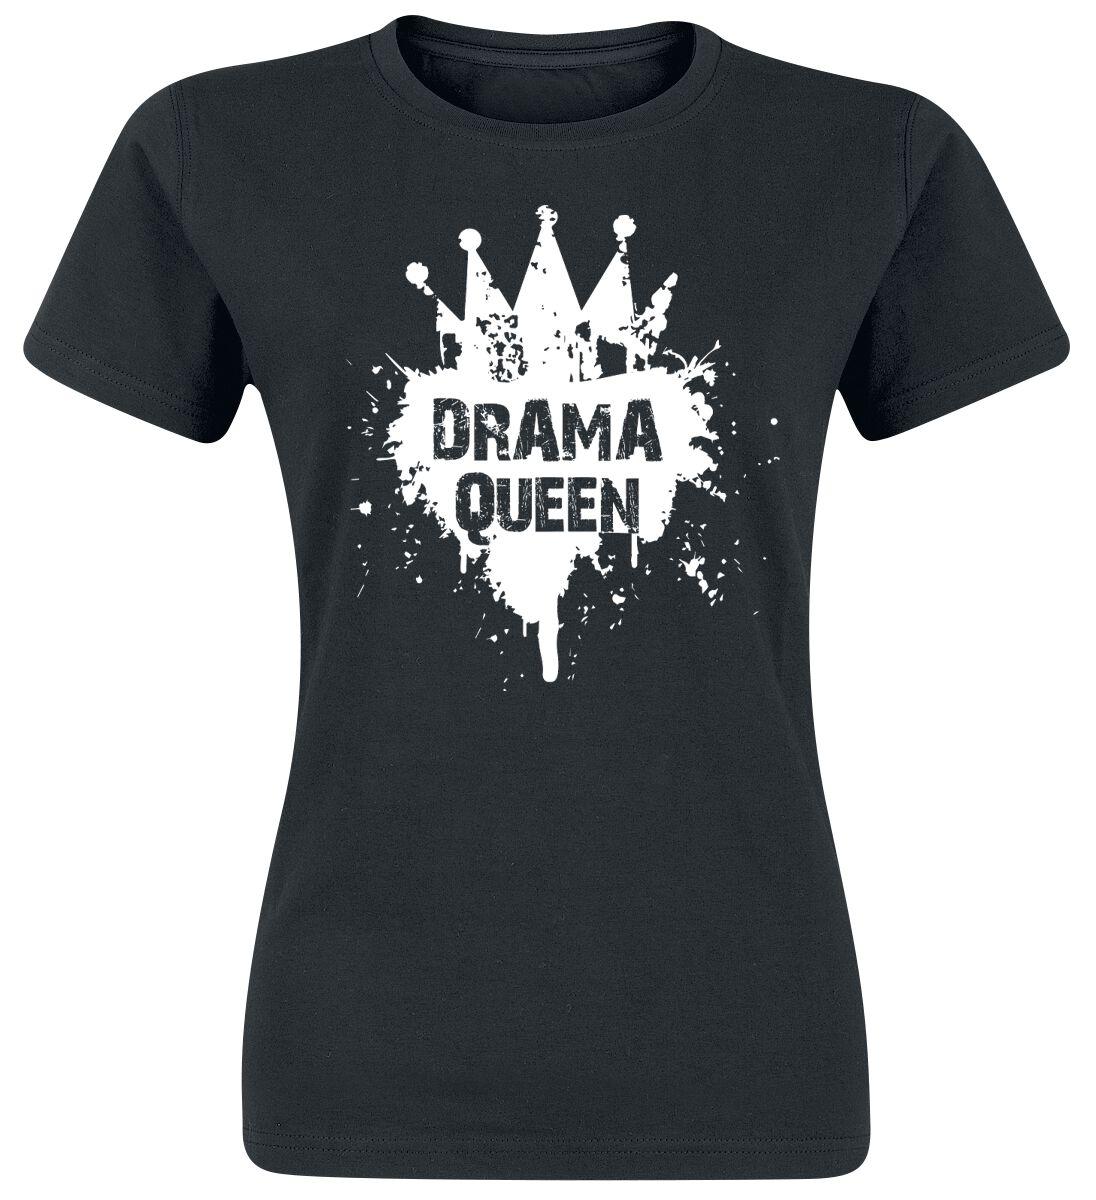 Fun Shirts - Koszulki - Koszulka damska Drama Queen Koszulka damska czarny - 345898